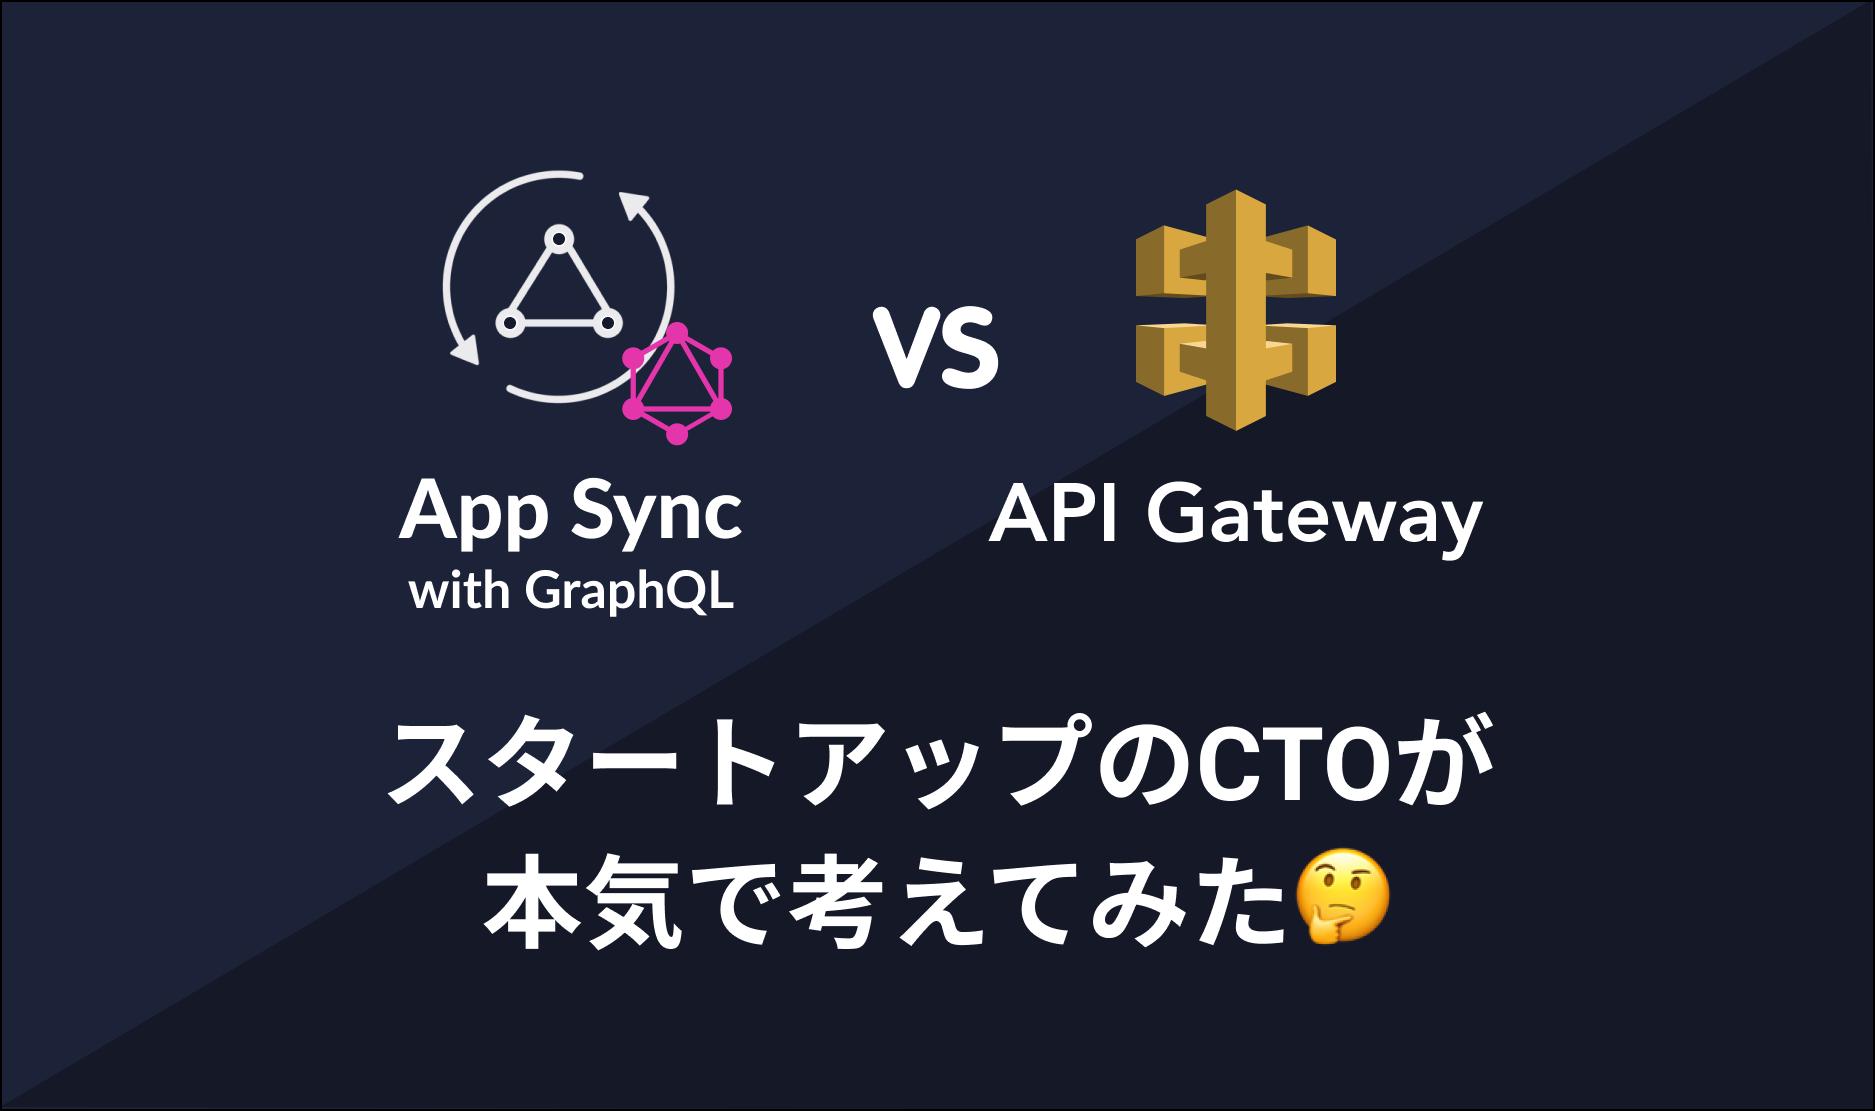 AppSync VS APIGateway 両者の違いをスタートアップCTOが本気で考えてみた!